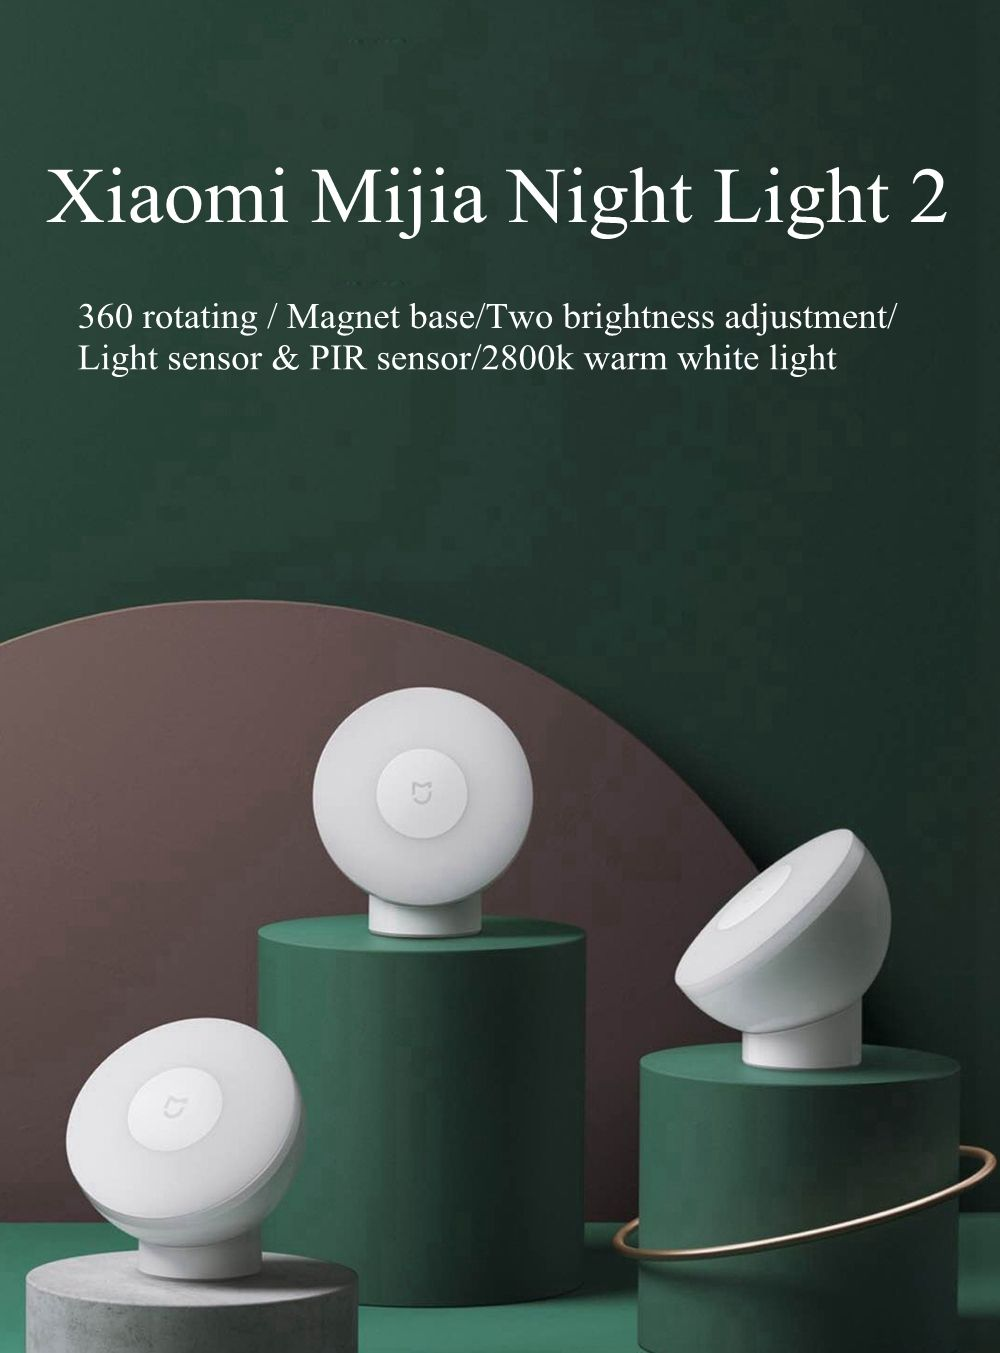 xiaomi_mijia_night_light_2_6.jpg